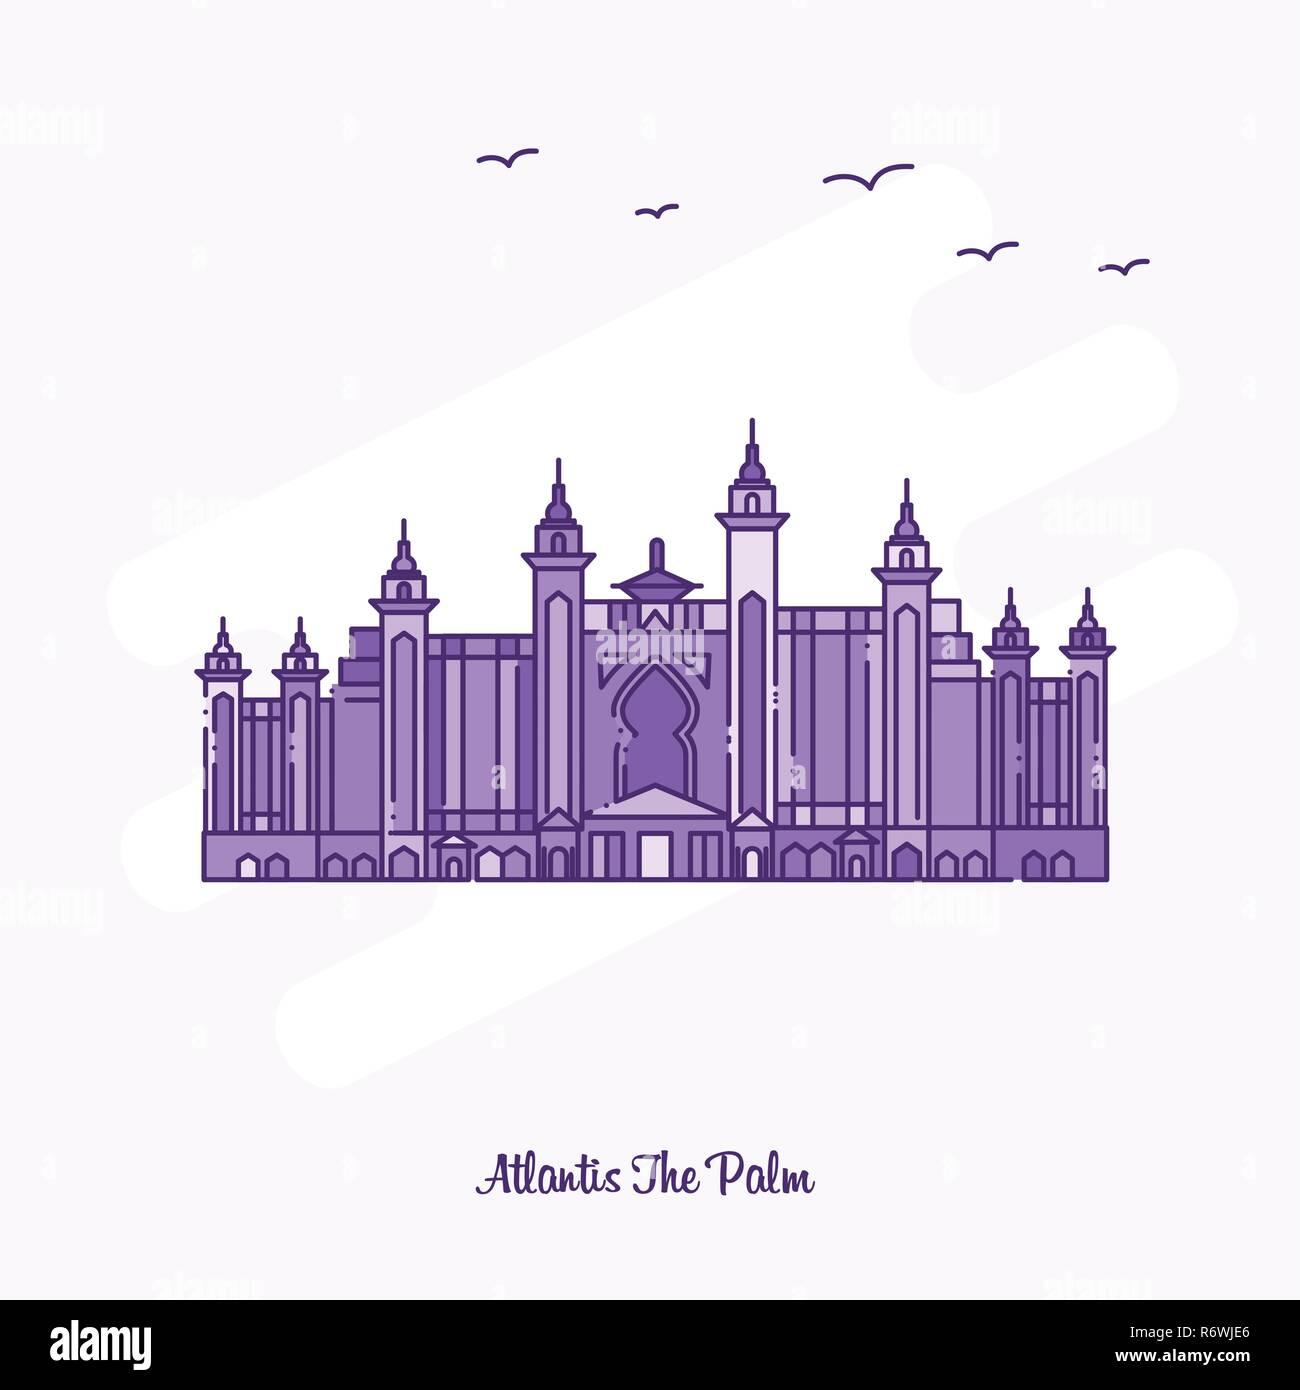 ATLANTIS THE PALM Landmark Purple Dotted Line skyline vector illustration - Stock Image